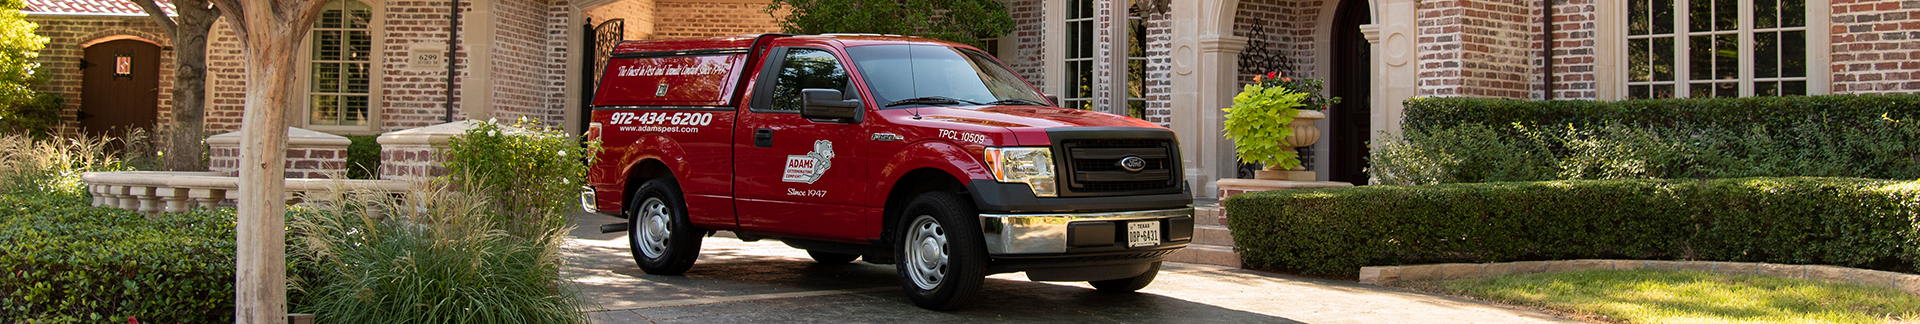 adams pest control's truck in murphy tx